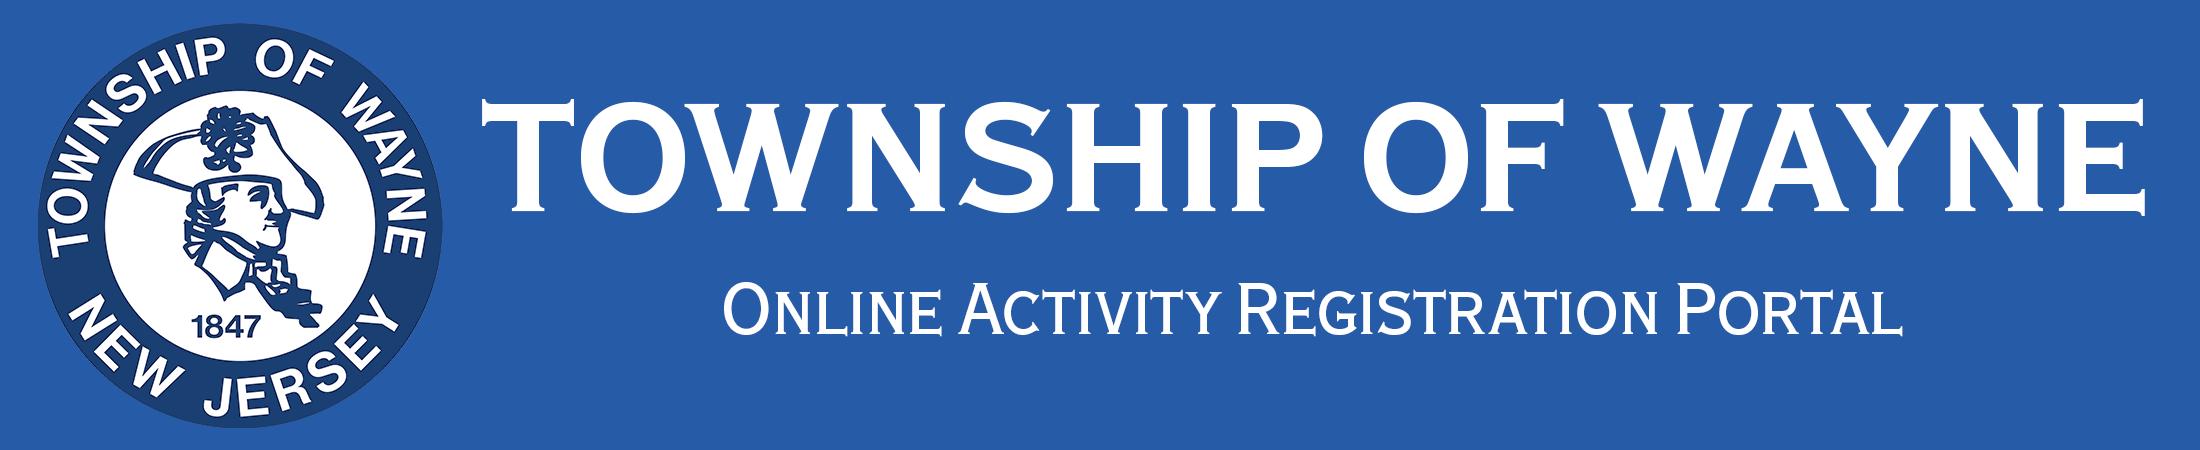 Wayne Township Activities Registration Portal